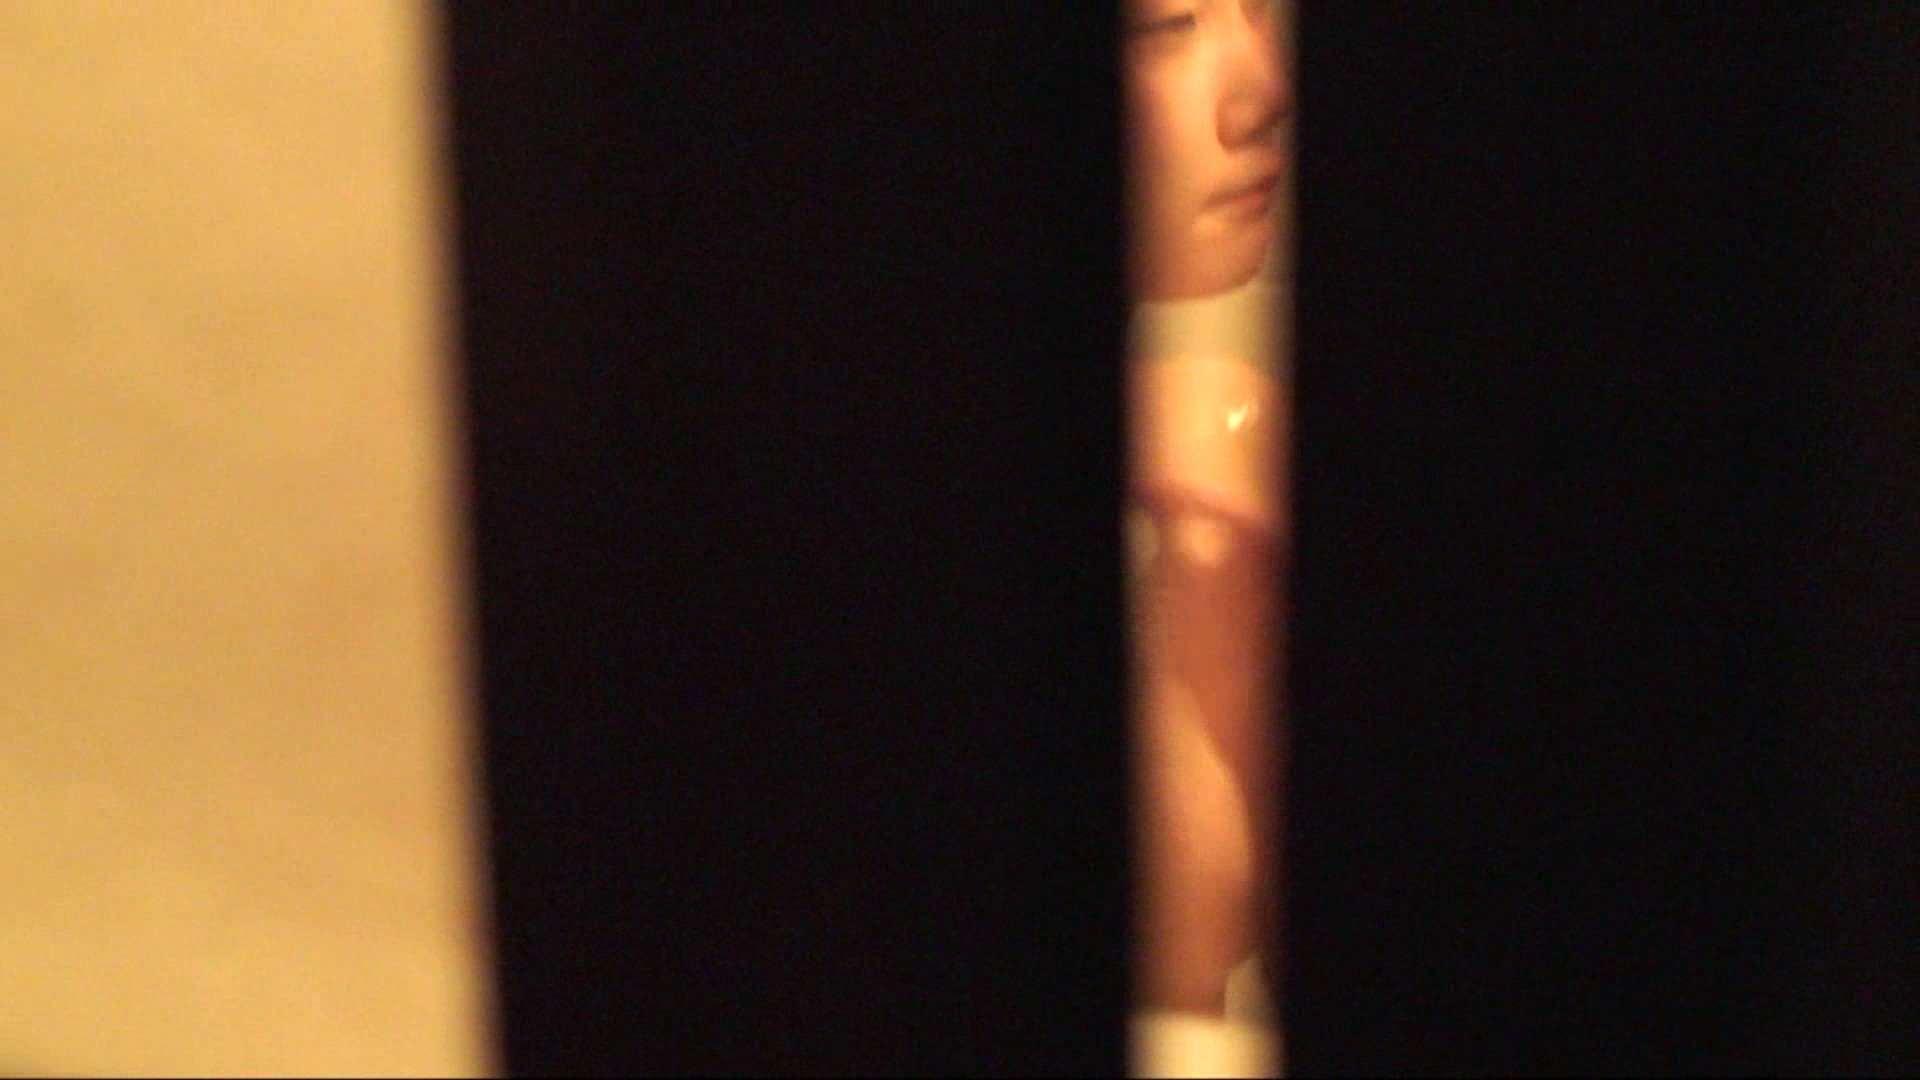 vol.02超可愛すぎる彼女の裸体をハイビジョンで!至近距離での眺め最高! エッチな盗撮 オマンコ動画キャプチャ 78pic 51